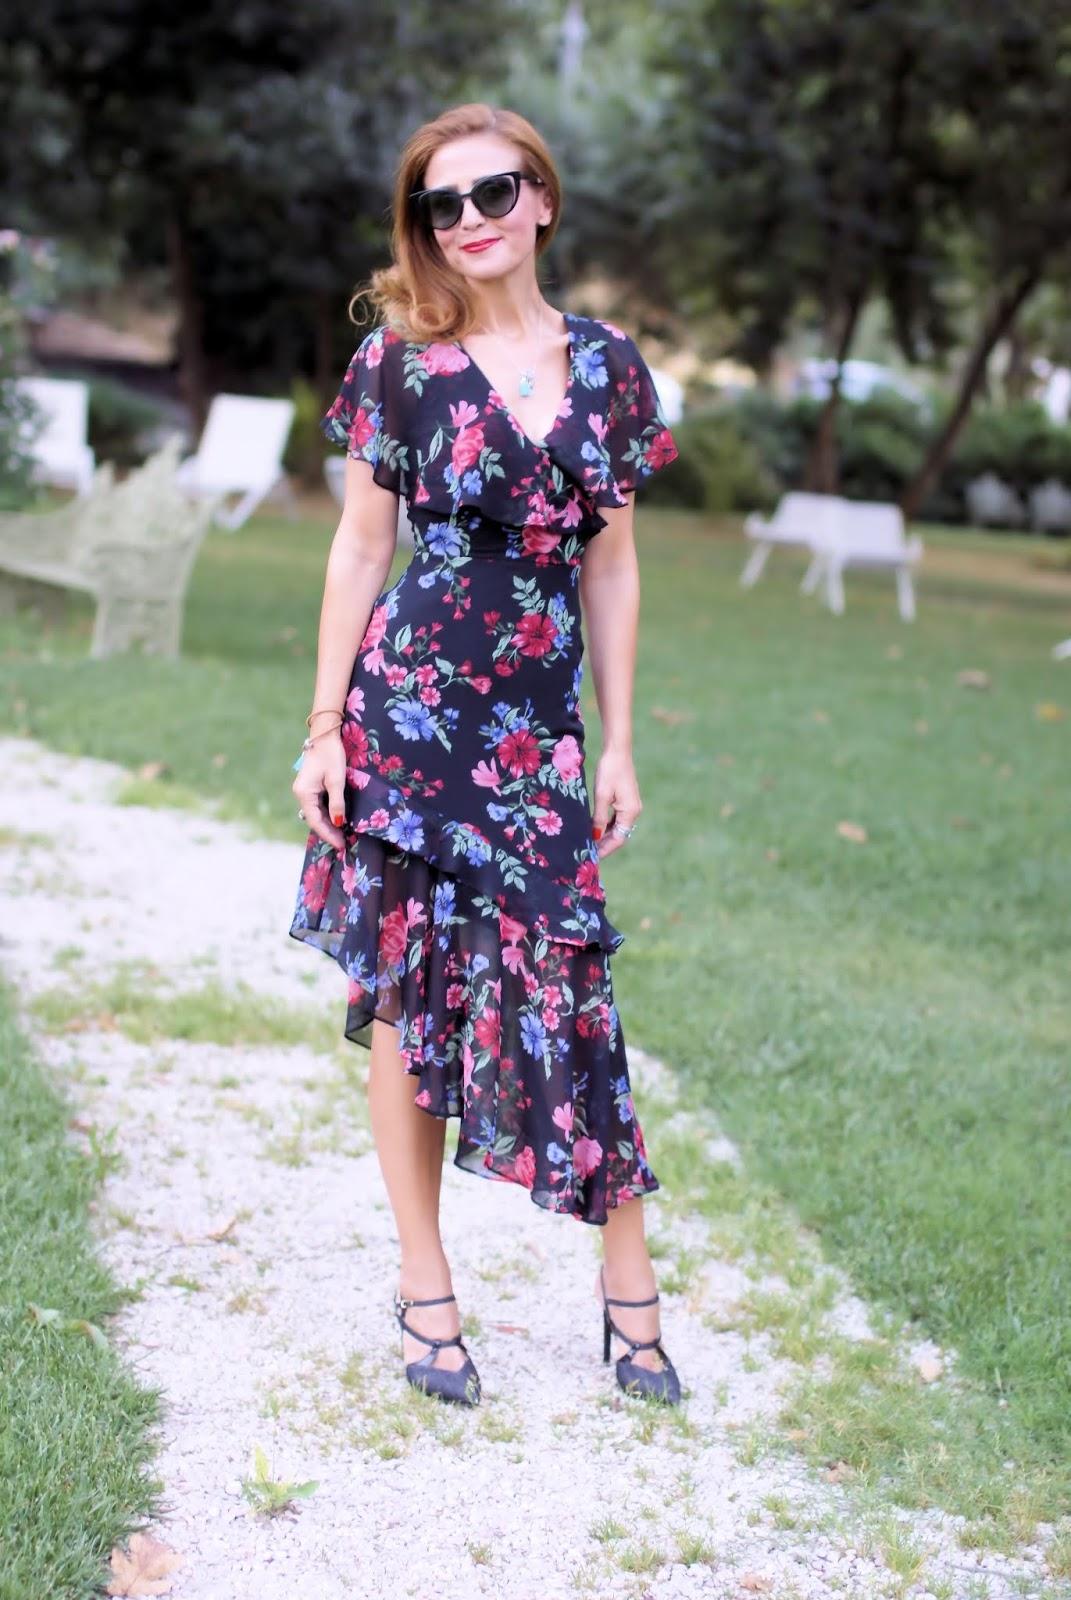 Latin style dress: sexy and feminine on Fashion and Cookies fashion blog, fashion blogger style